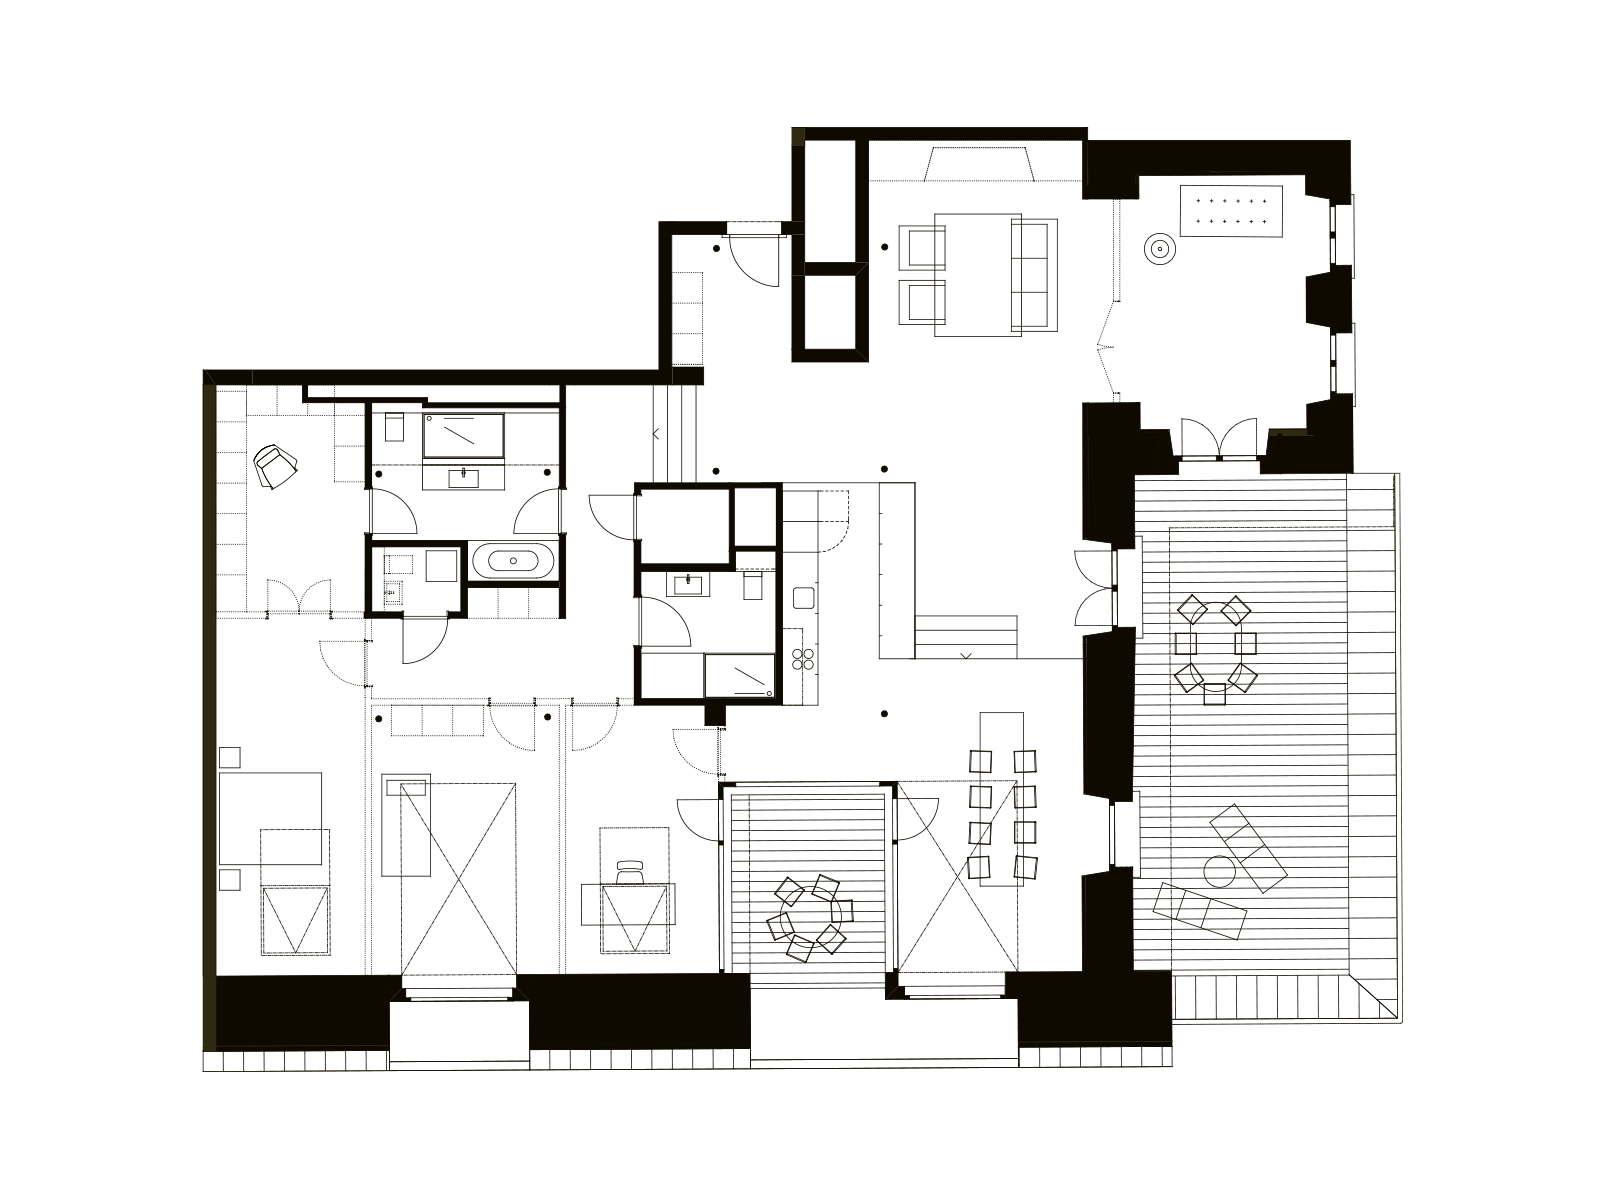 E.4.07